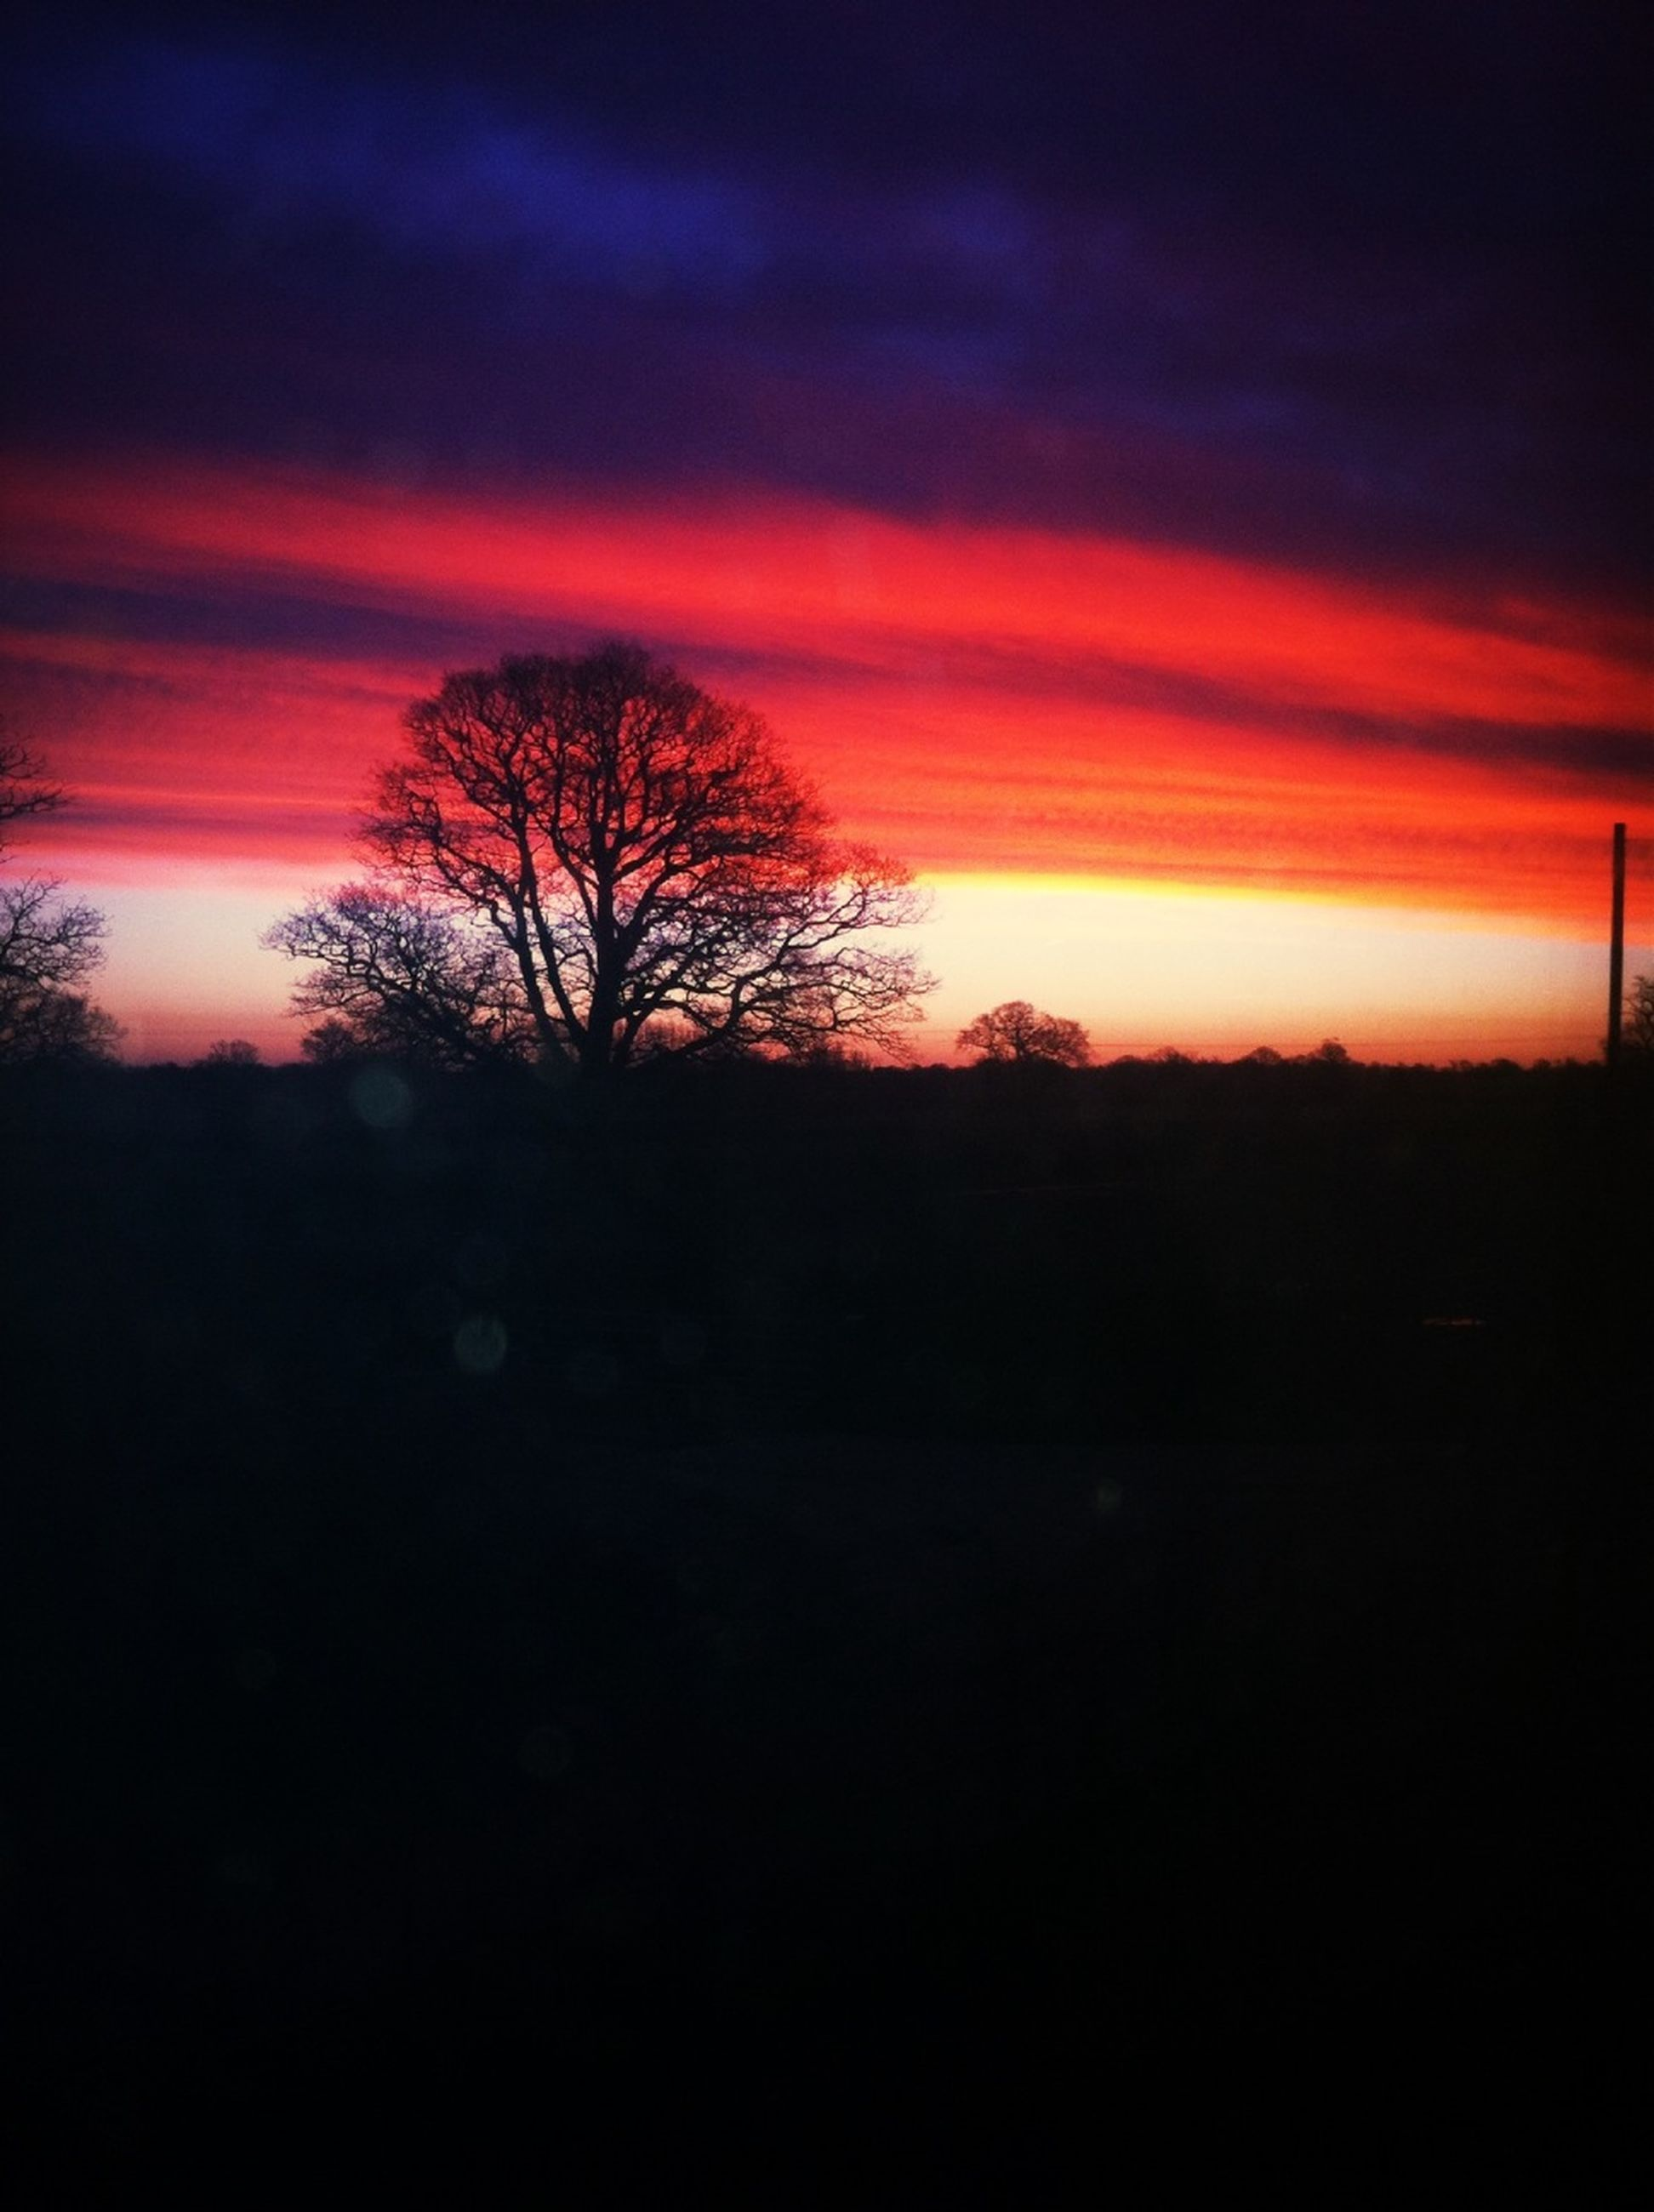 sunset, silhouette, tranquil scene, tranquility, scenics, orange color, sky, beauty in nature, tree, bare tree, landscape, nature, idyllic, cloud - sky, dramatic sky, dark, dusk, non-urban scene, outdoors, field